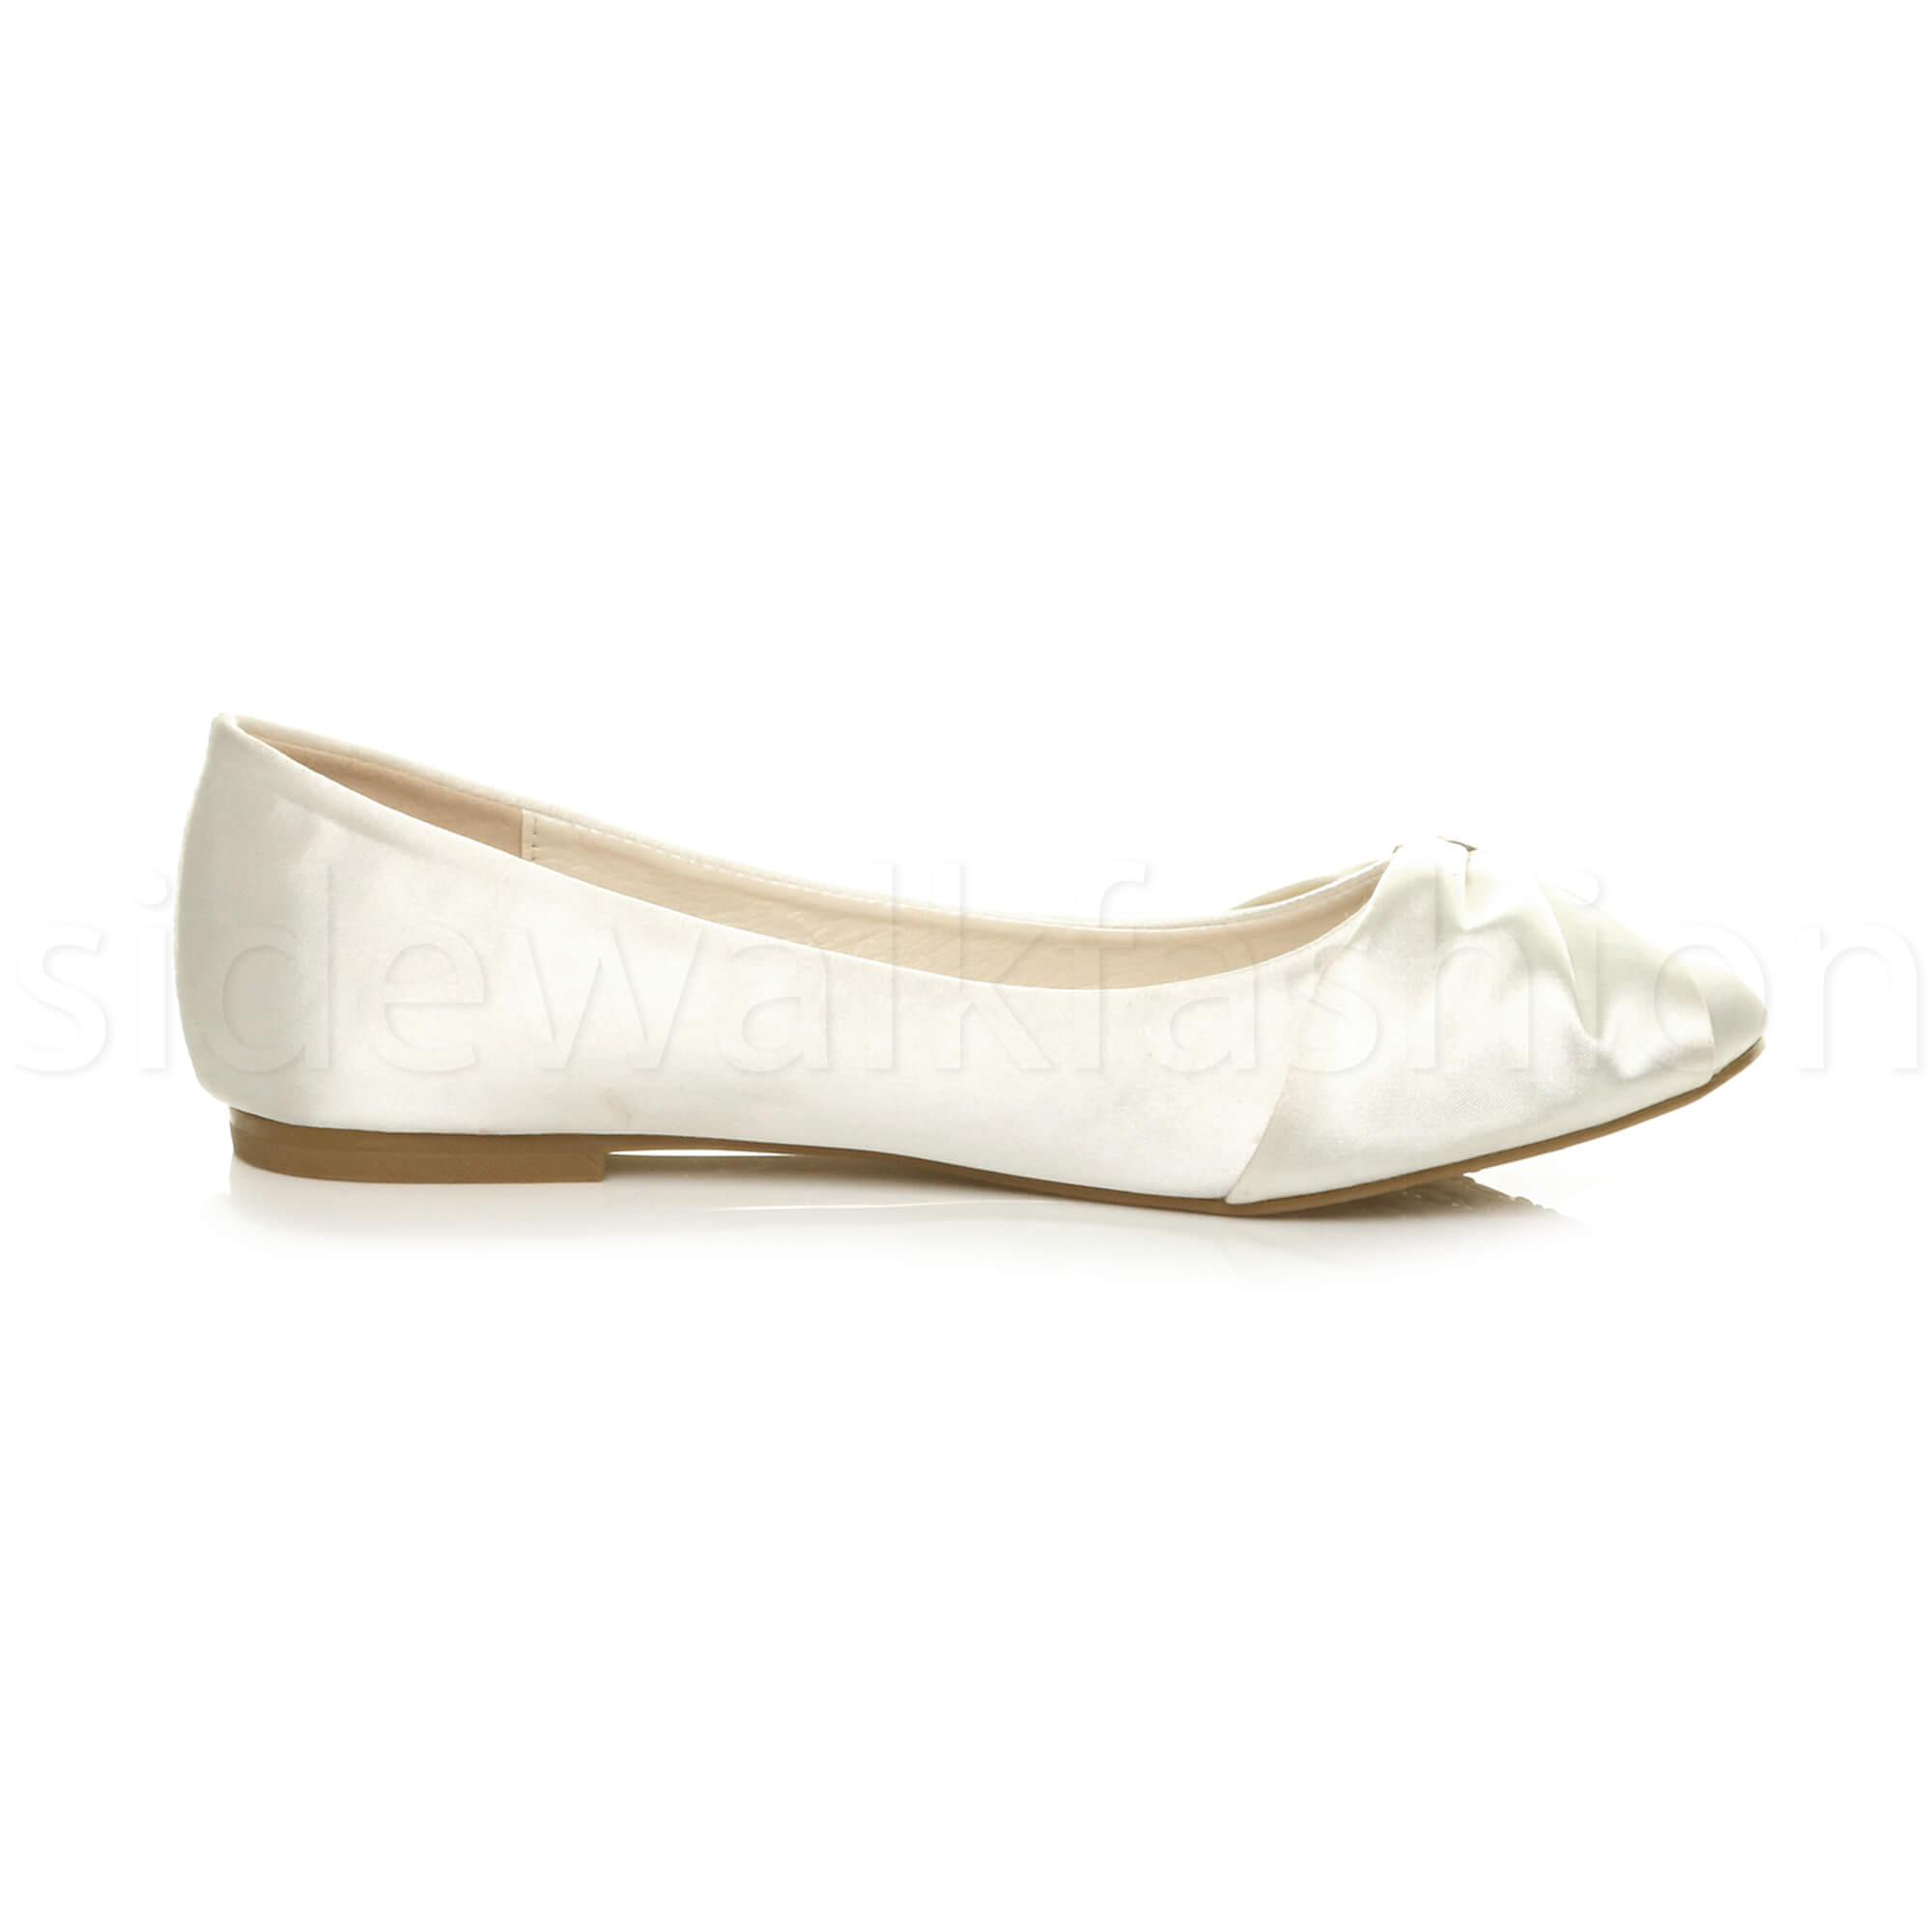 Womens-ladies-flat-wedding-bridesmaid-ruched-diamante-bridal-shoes-pumps-size thumbnail 12